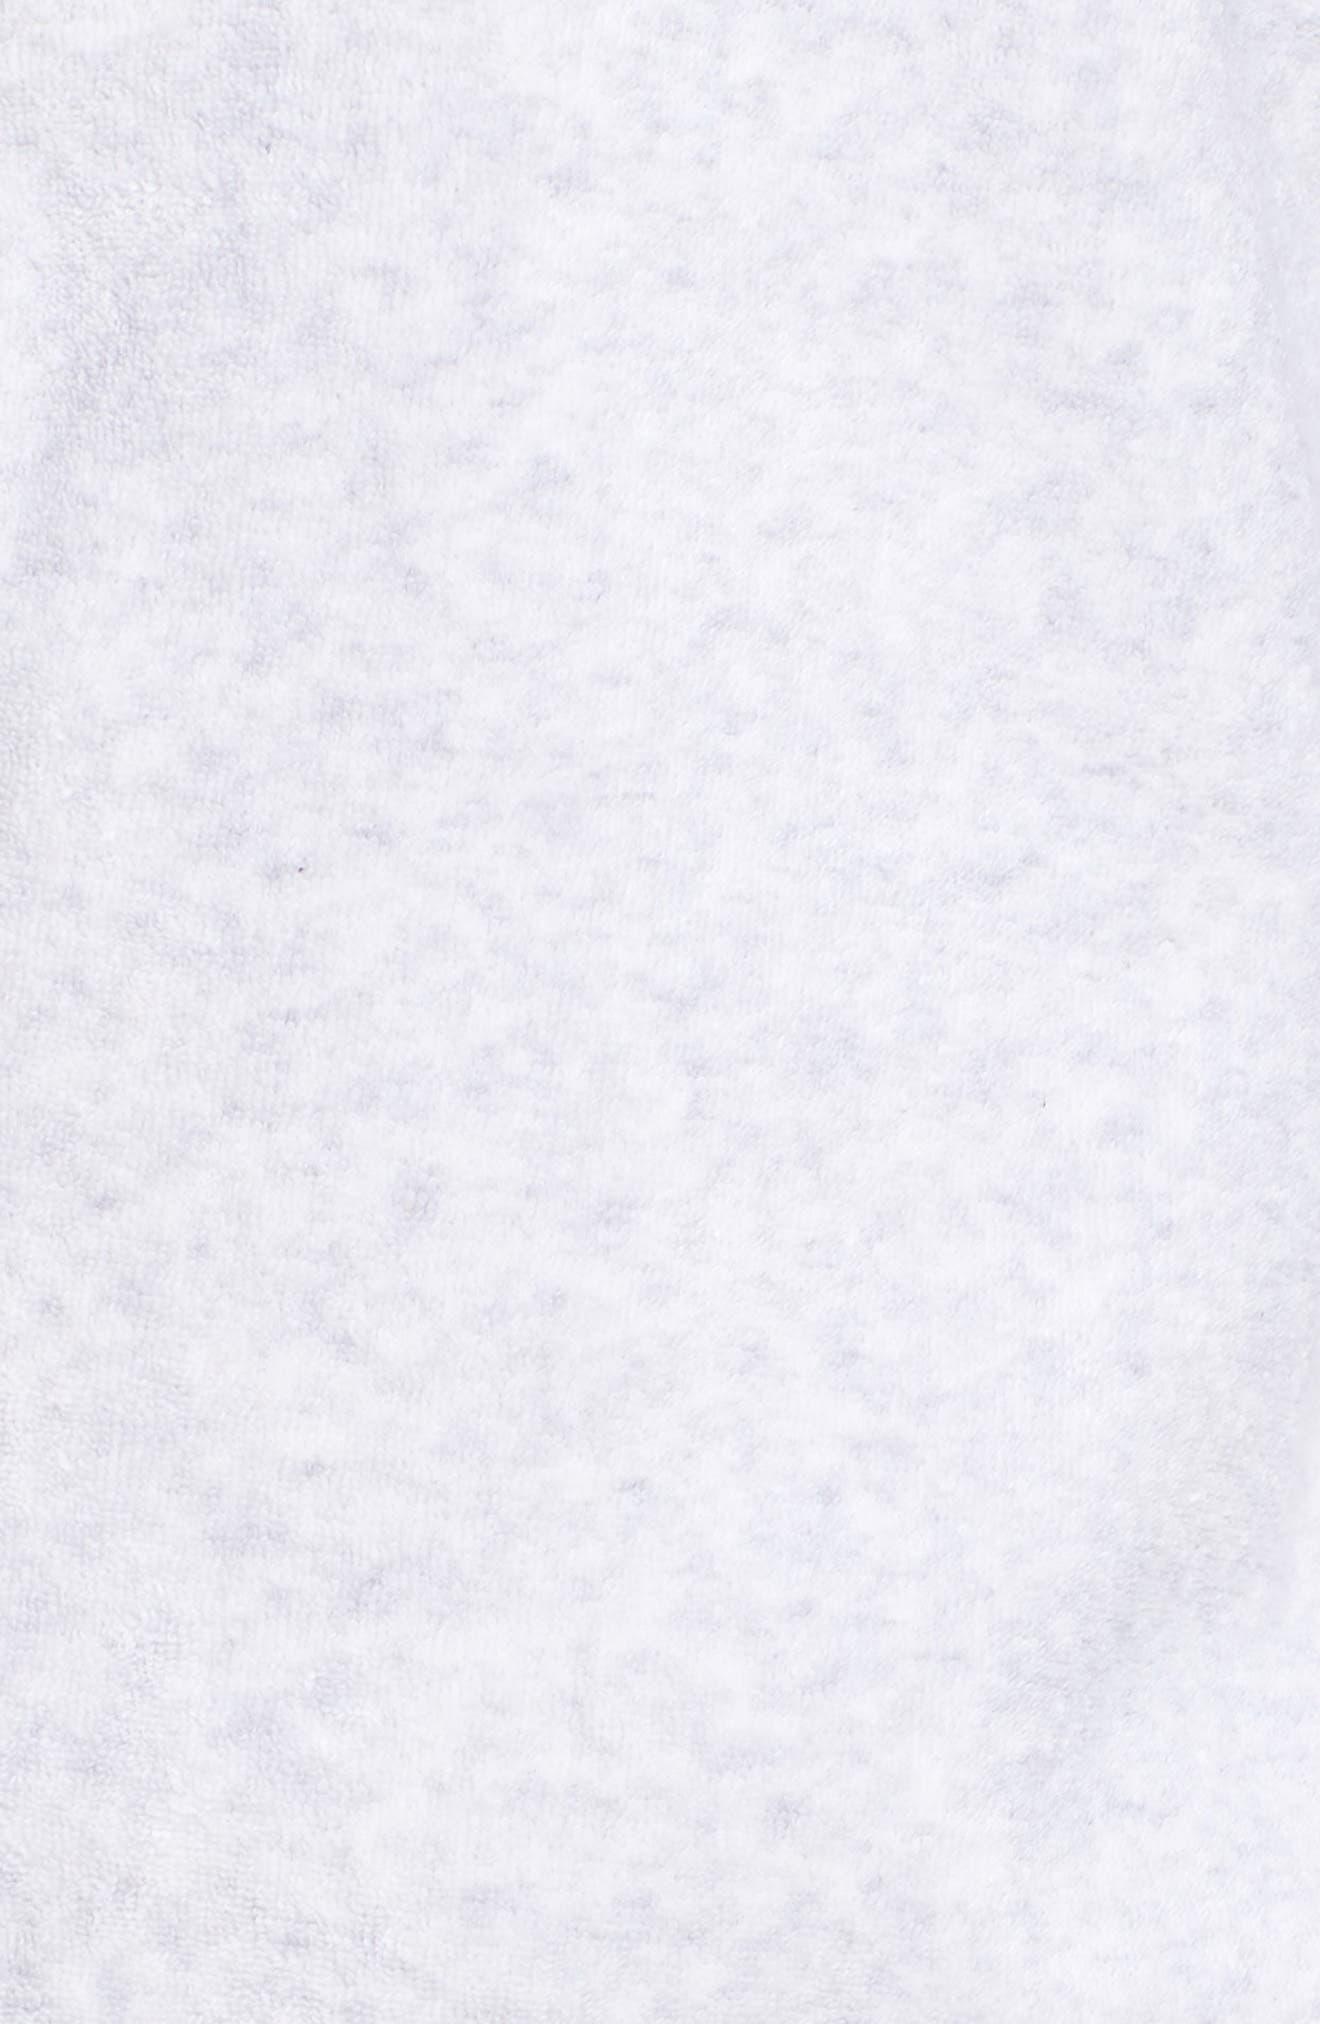 Sportswear French Terry Jacket,                             Alternate thumbnail 7, color,                             Birch Heather/ White/ Black